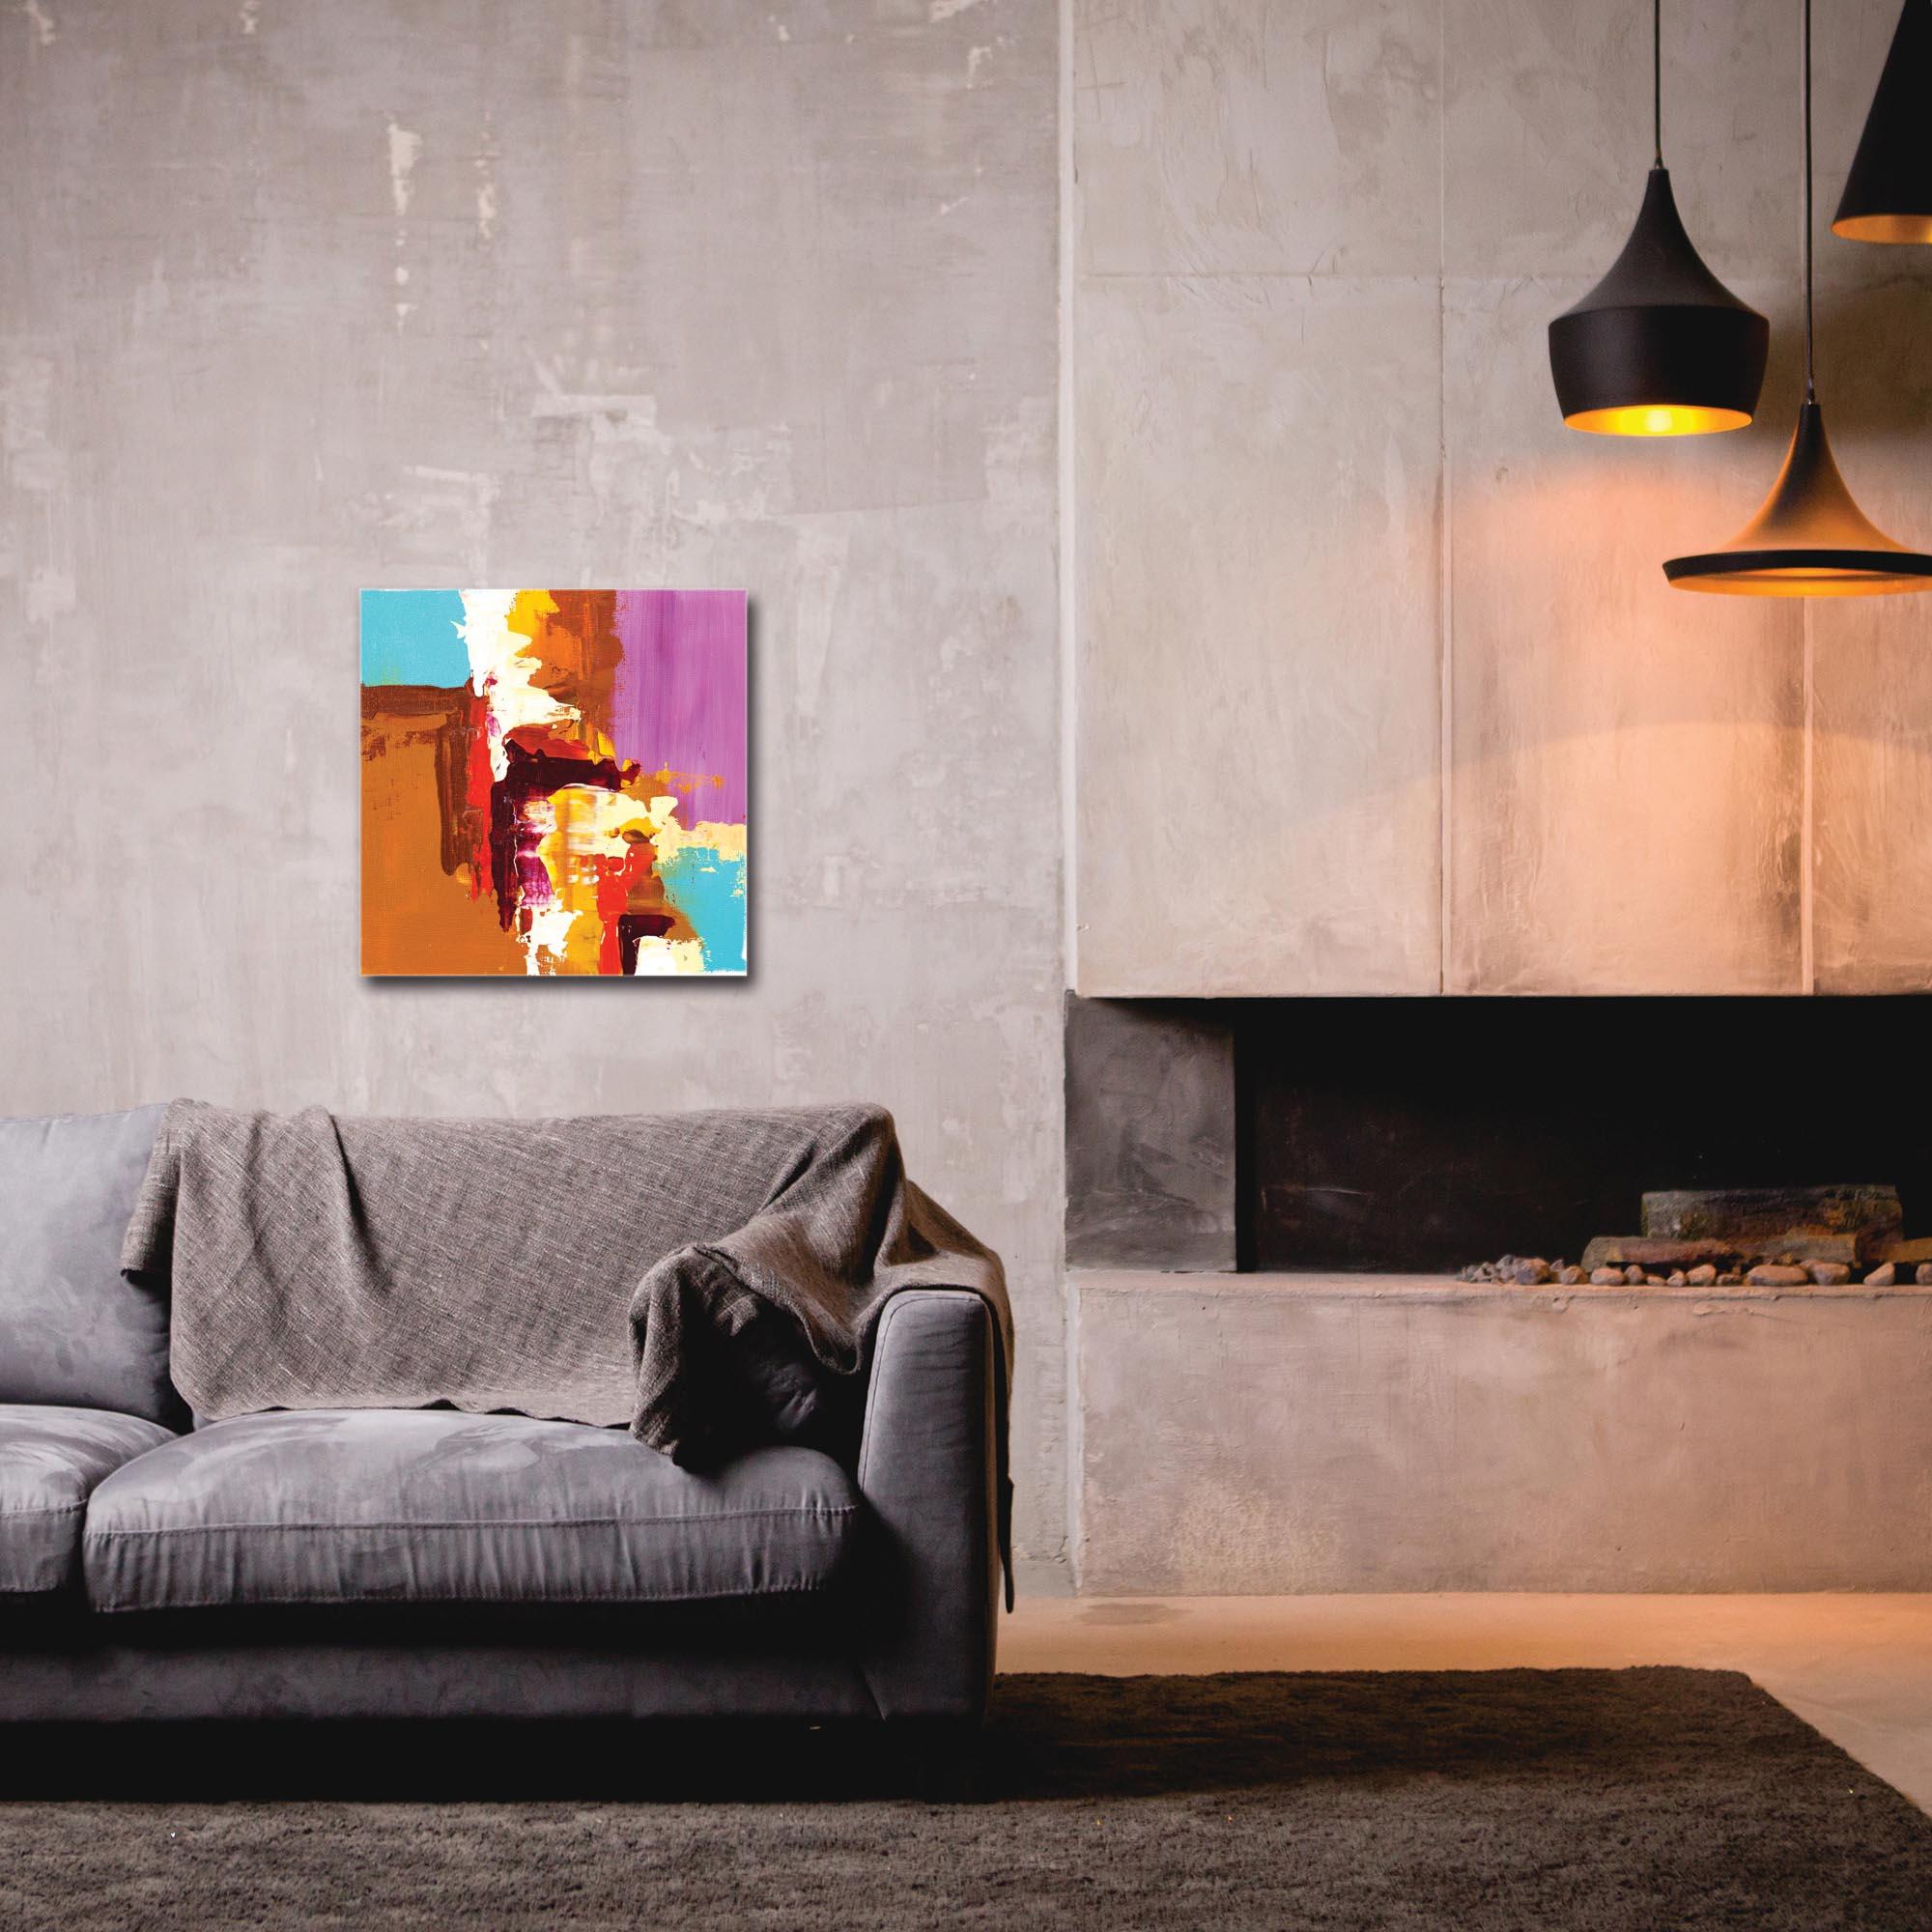 Abstract Wall Art 'Urban Life 12' - Urban Decor on Metal or Plexiglass - Image 3